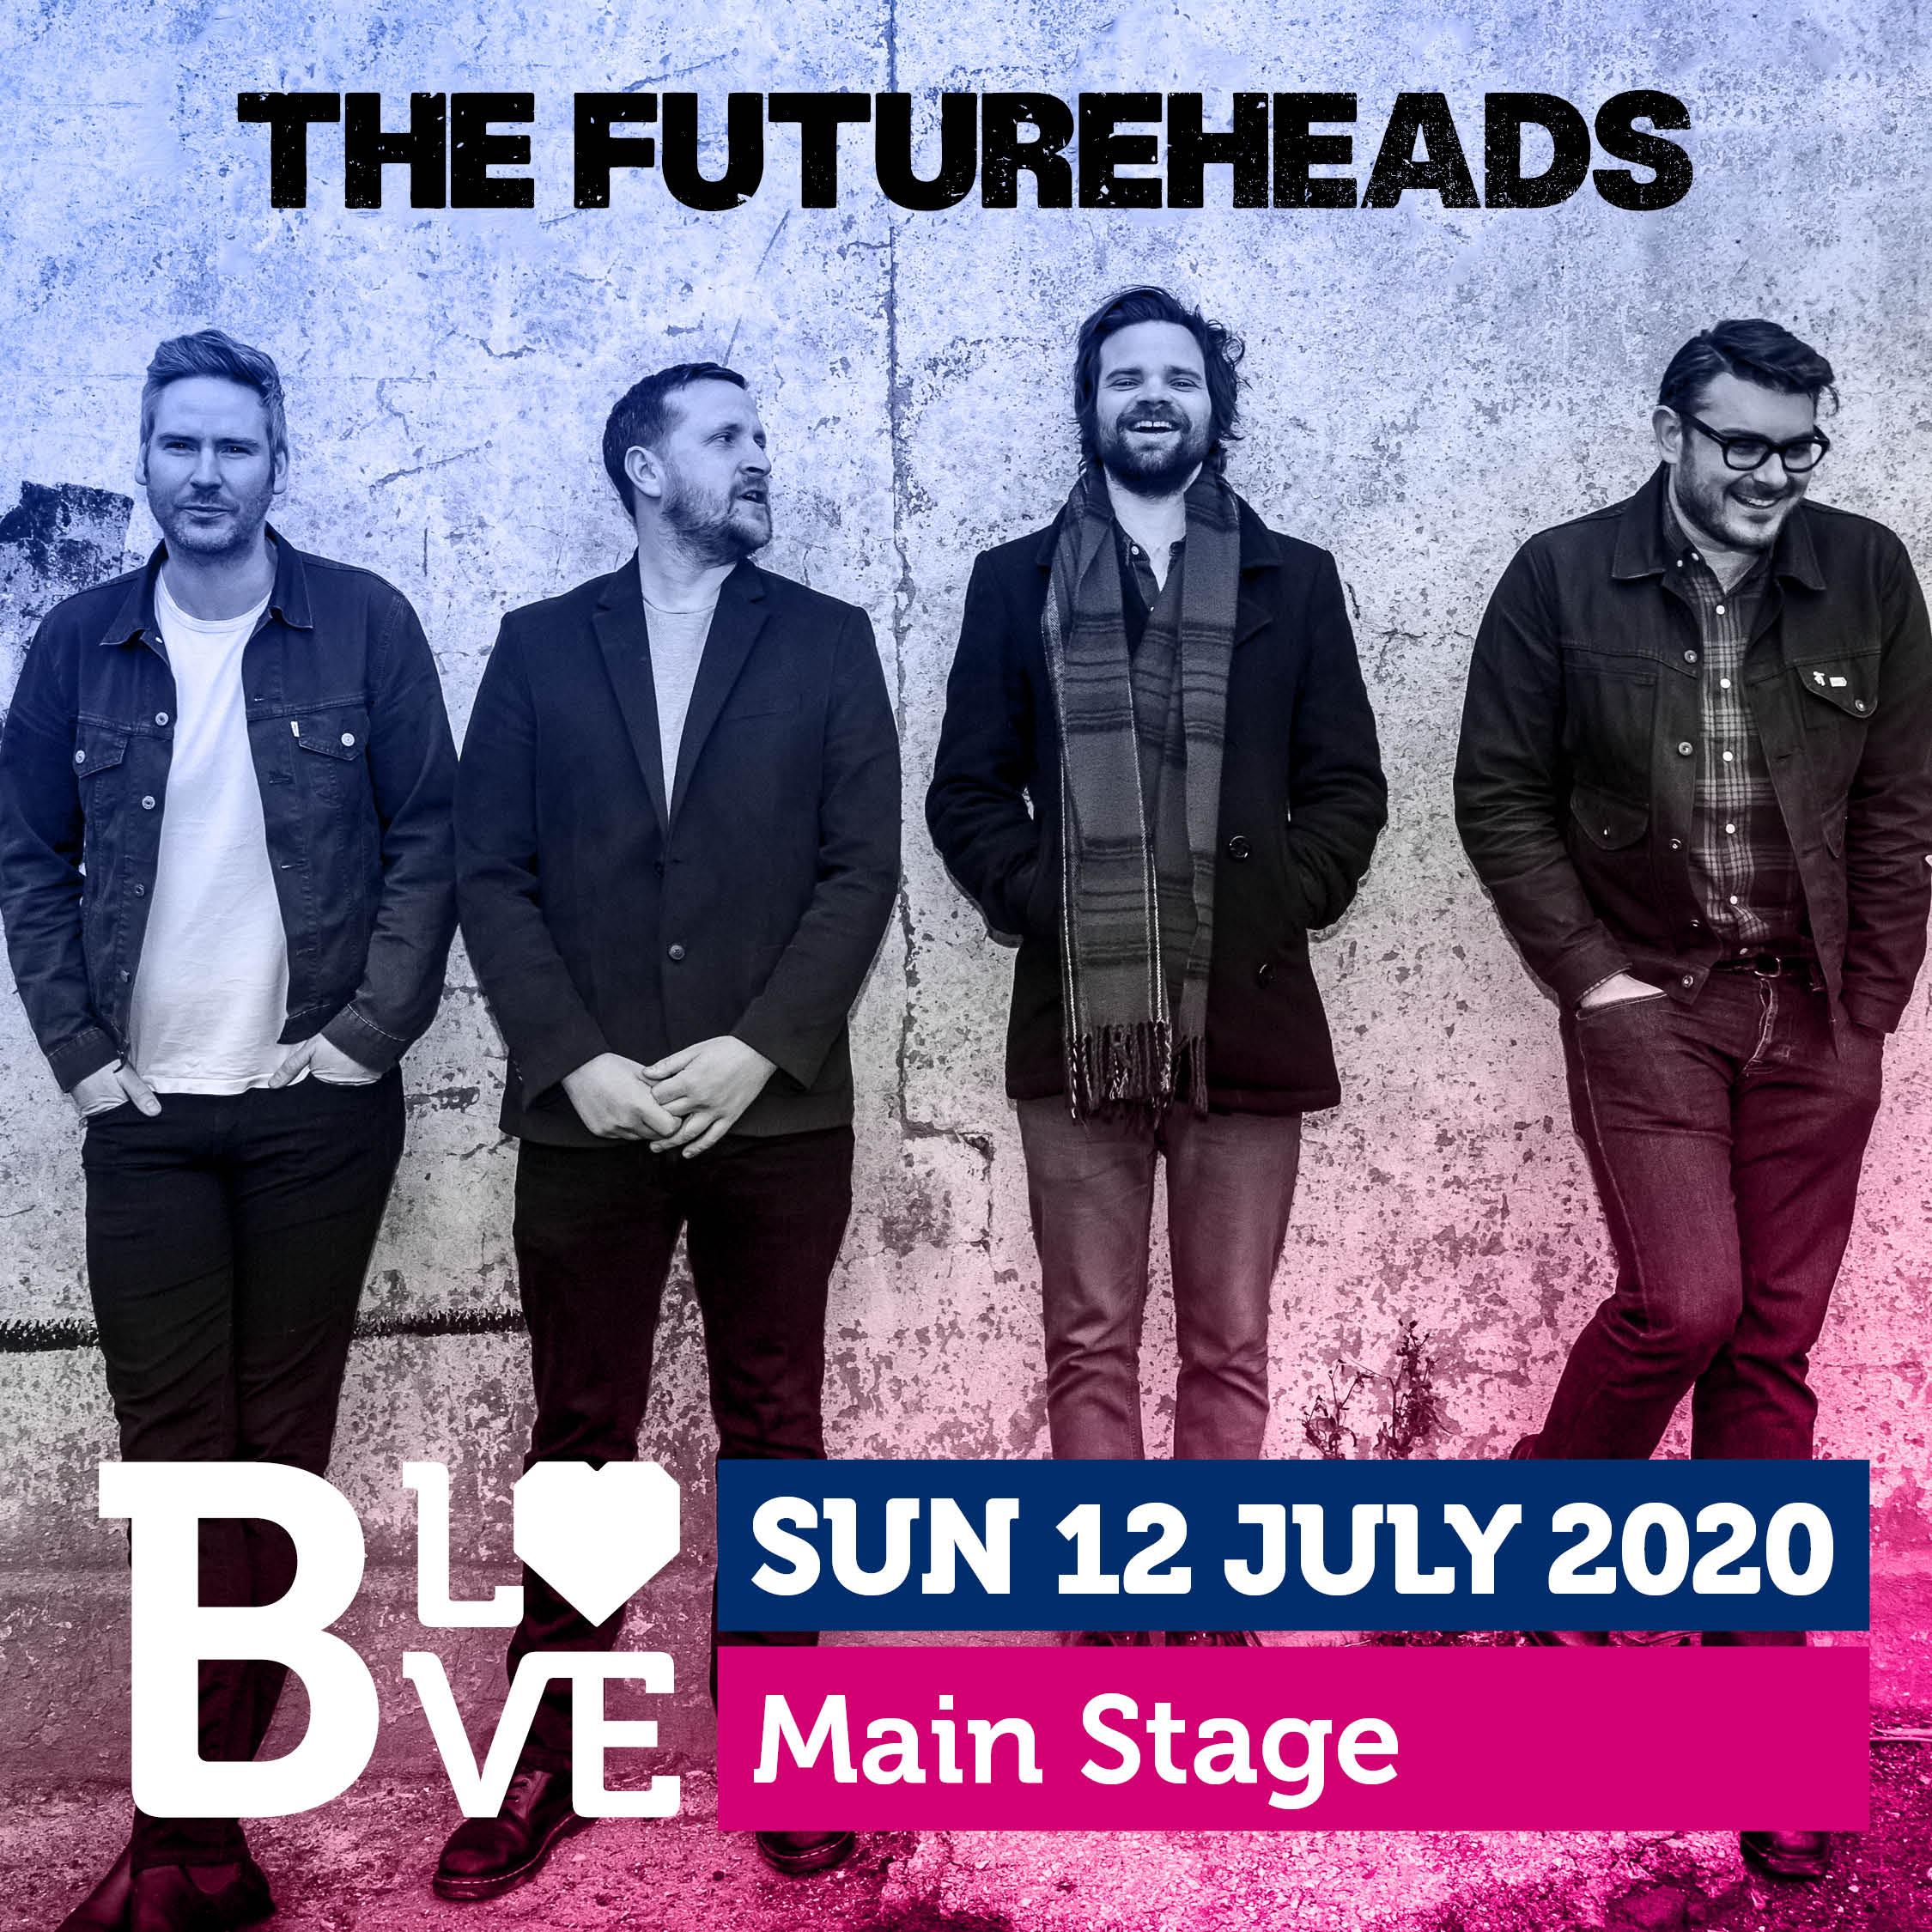 https://blovemusic.com/wp-content/uploads/2020/02/34352-BLOVE_Headline-announcement-various-card-The-Futureheads.jpg